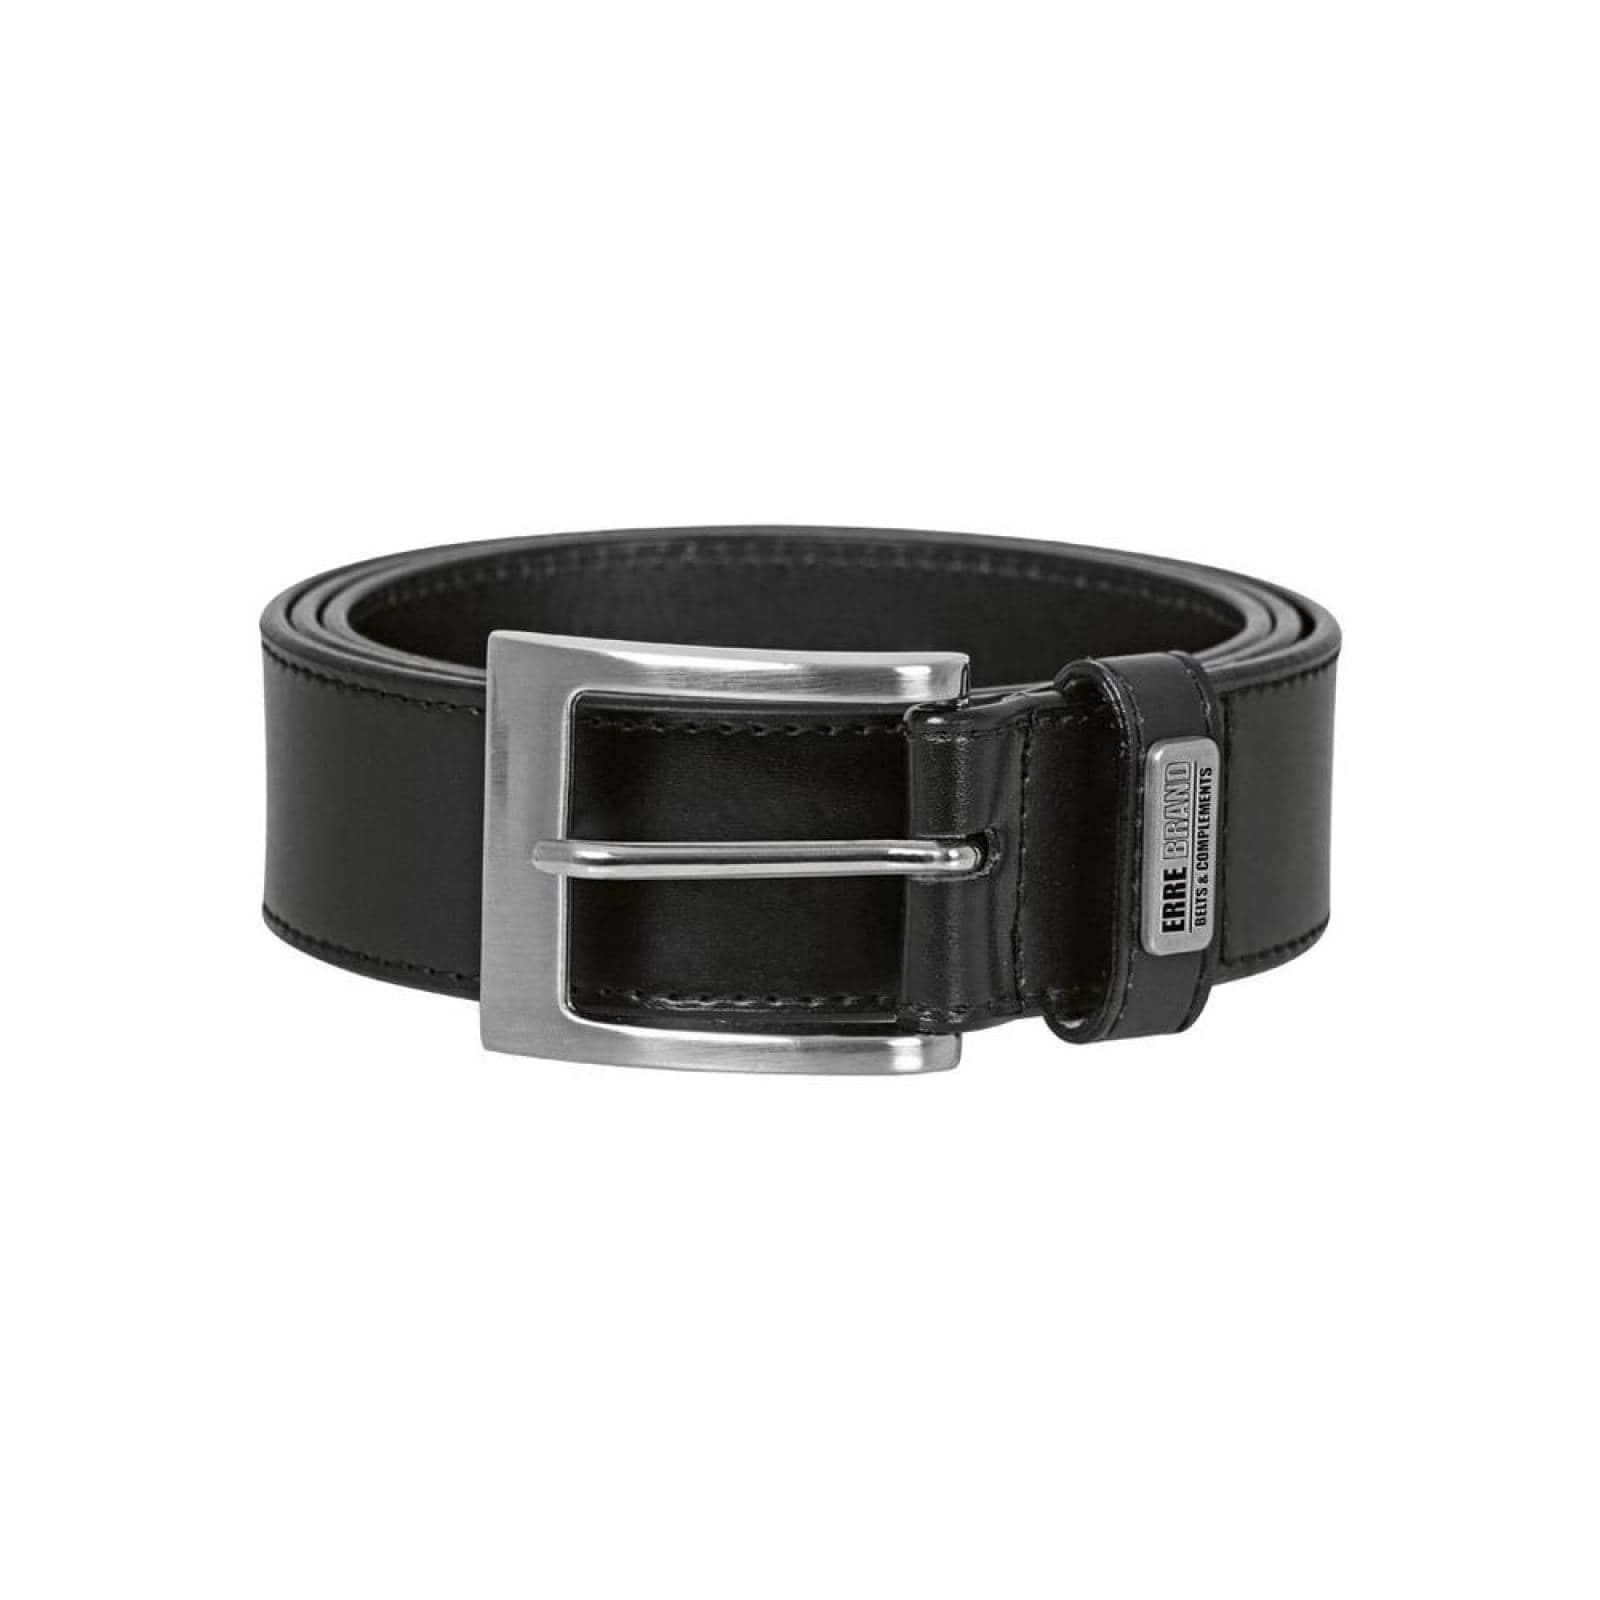 Cinturon Erre Unisex Negro Piel V2340Nopk2